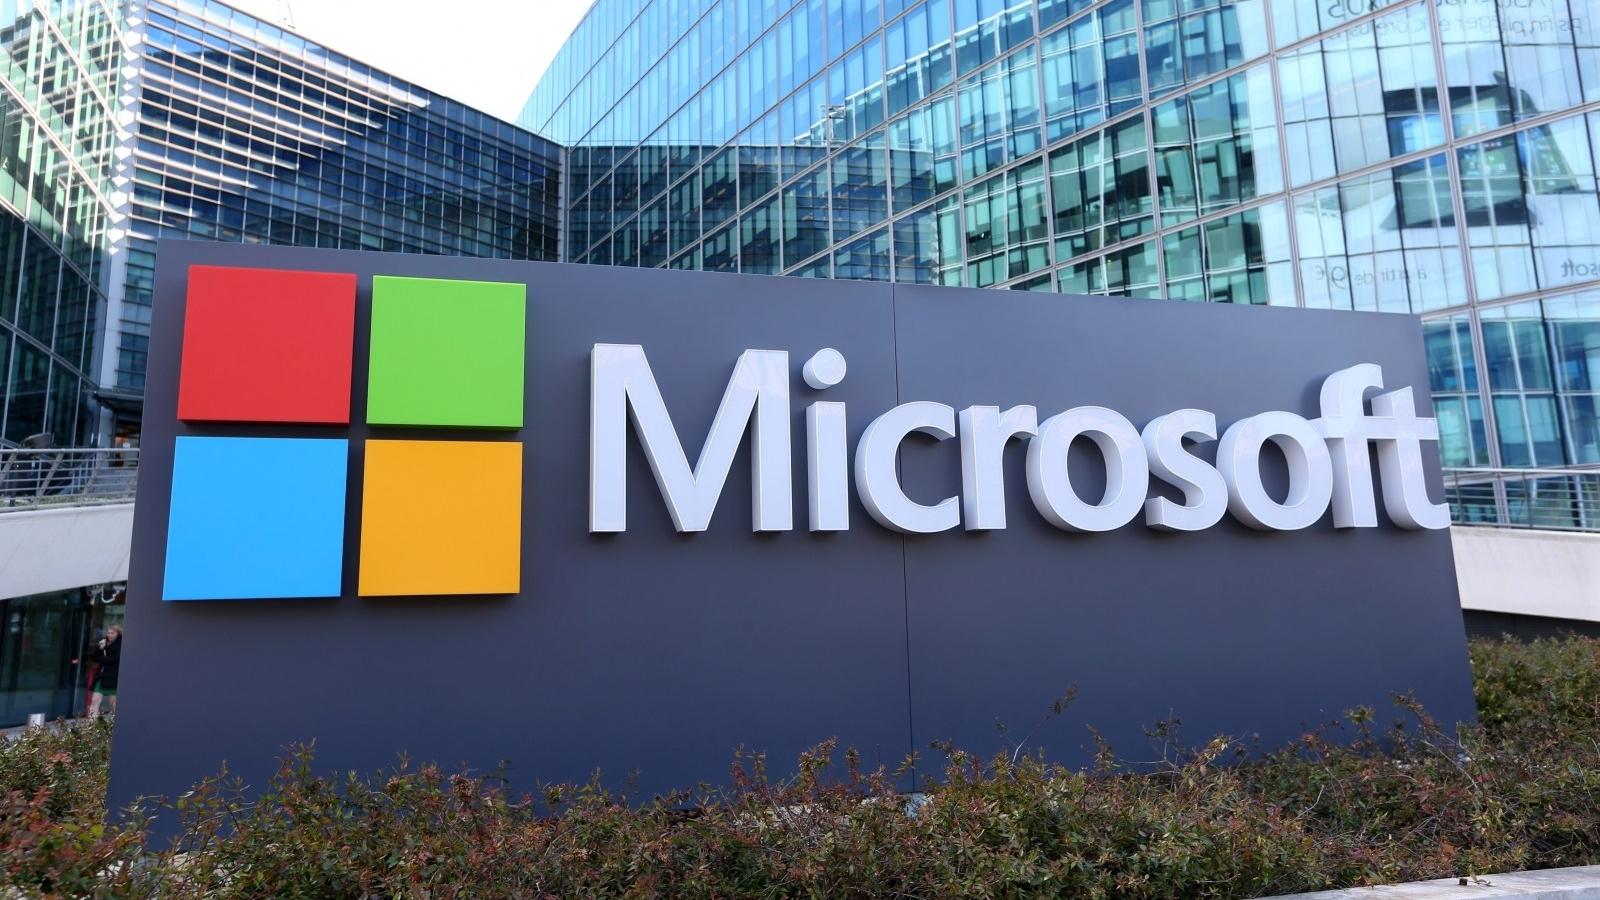 India-Microsoft MoU on Digital Transformation of Tribal Schools | பழங்குடியினர் பள்ளிகளின் டிஜிட்டல் மாற்றம் குறித்து இந்தியா-மைக்ரோசாஃப்ட் நிறுவனம் புரிந்துணர்வு ஒப்பந்தம் புரிந்துள்ளது |_40.1